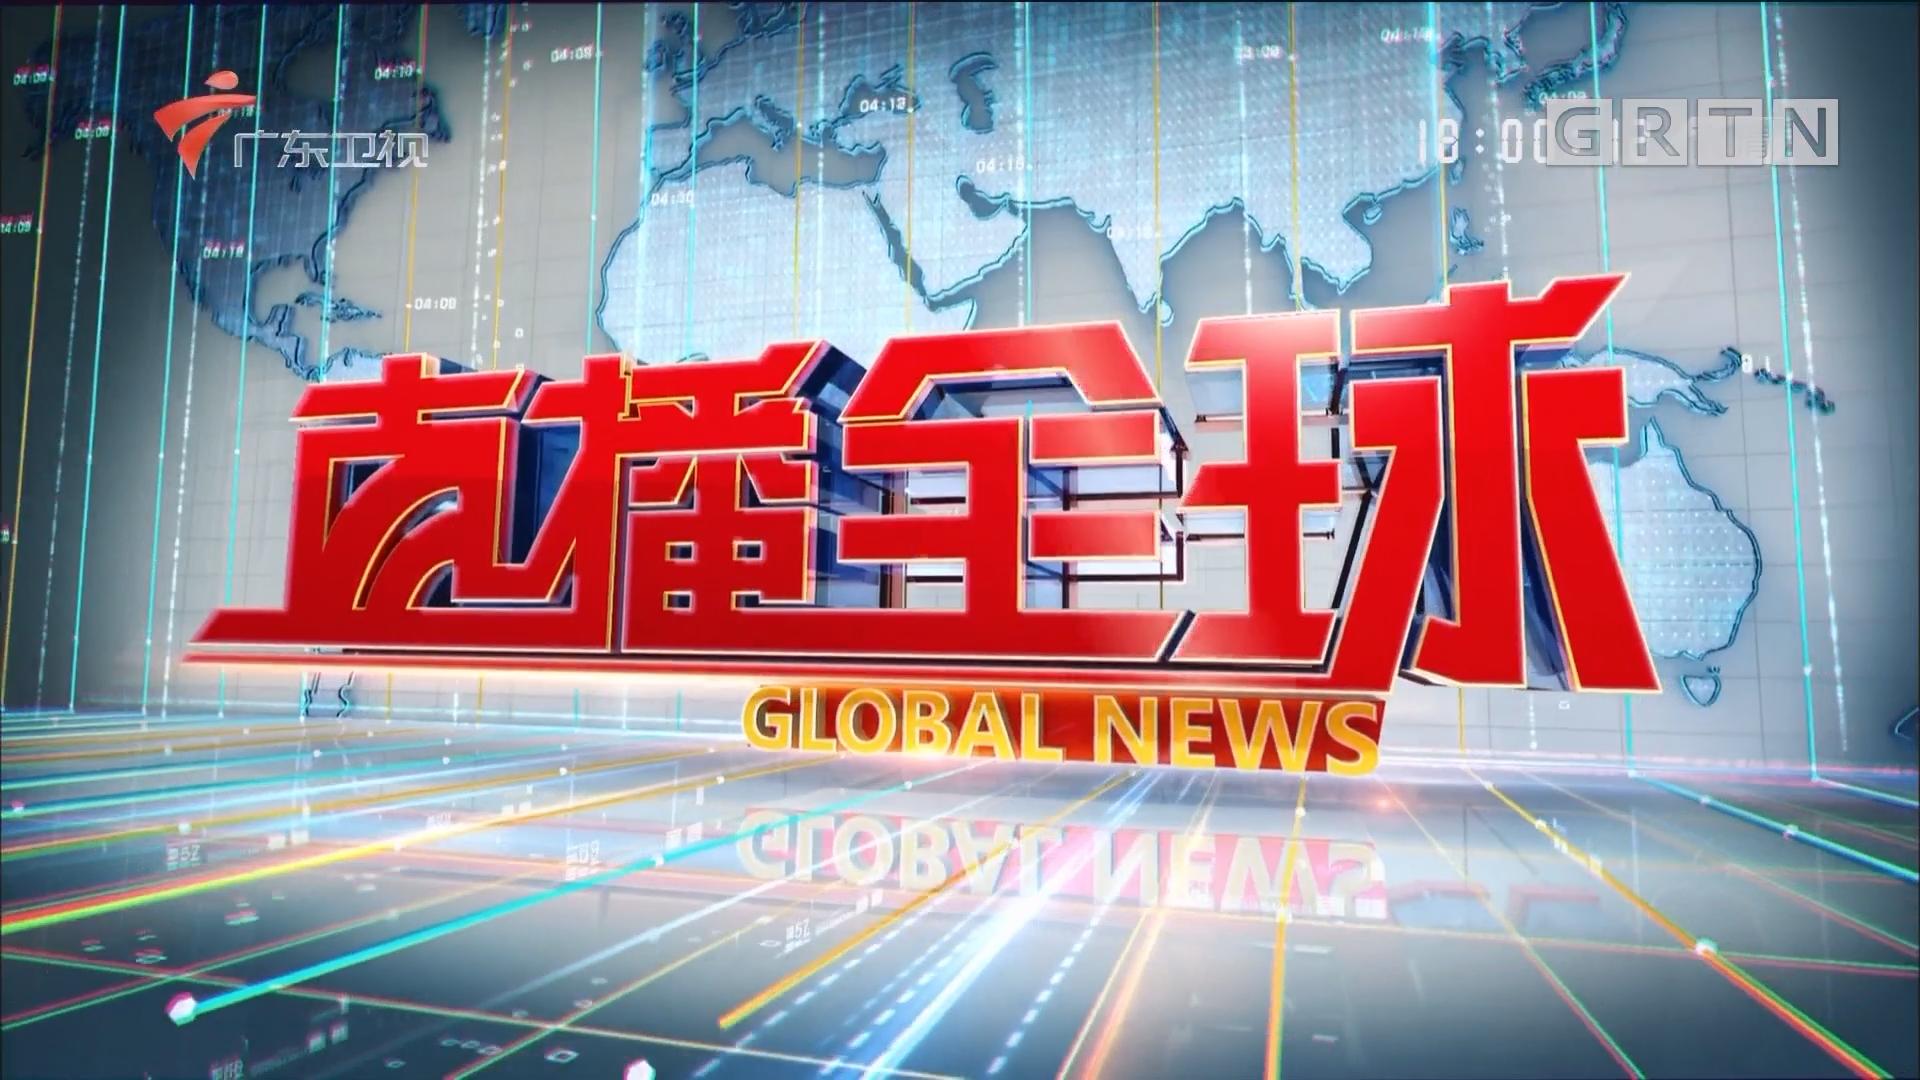 [HD][2017-11-03]直播全球:美军公布军舰撞船事件报告:错误操作 本可避免